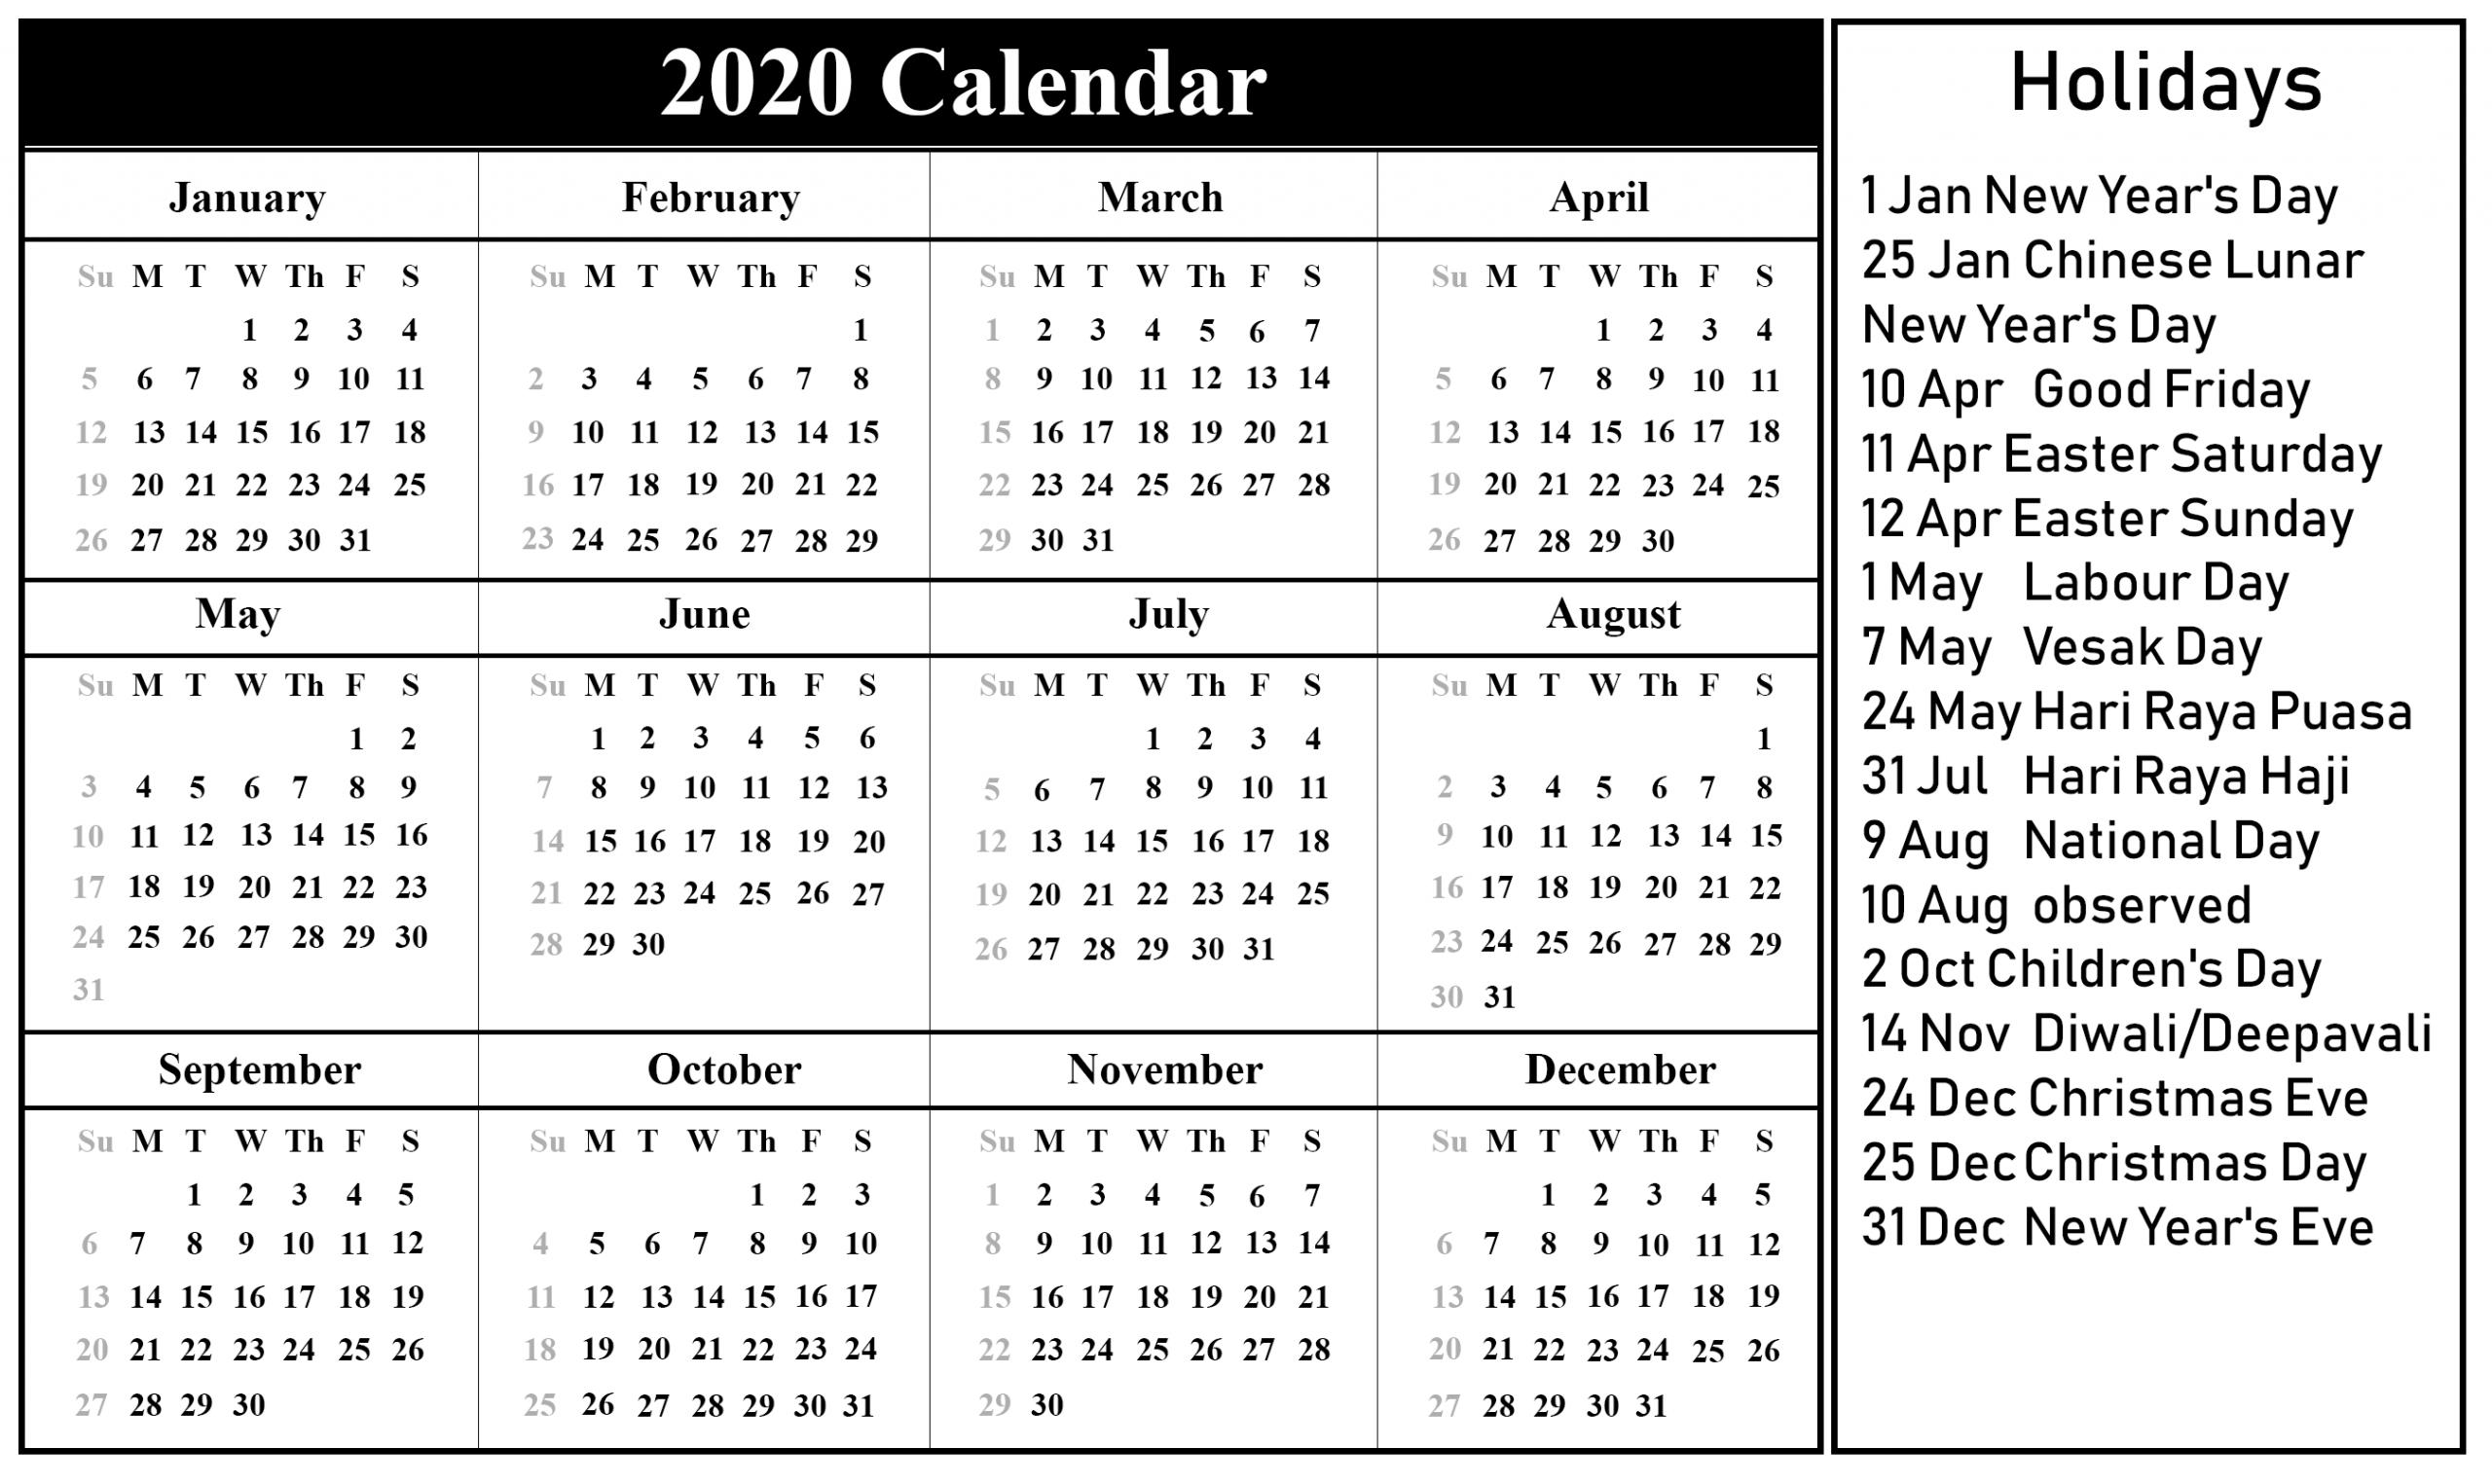 Printable 2020 Calendar With Holidays | Monthly Calendar